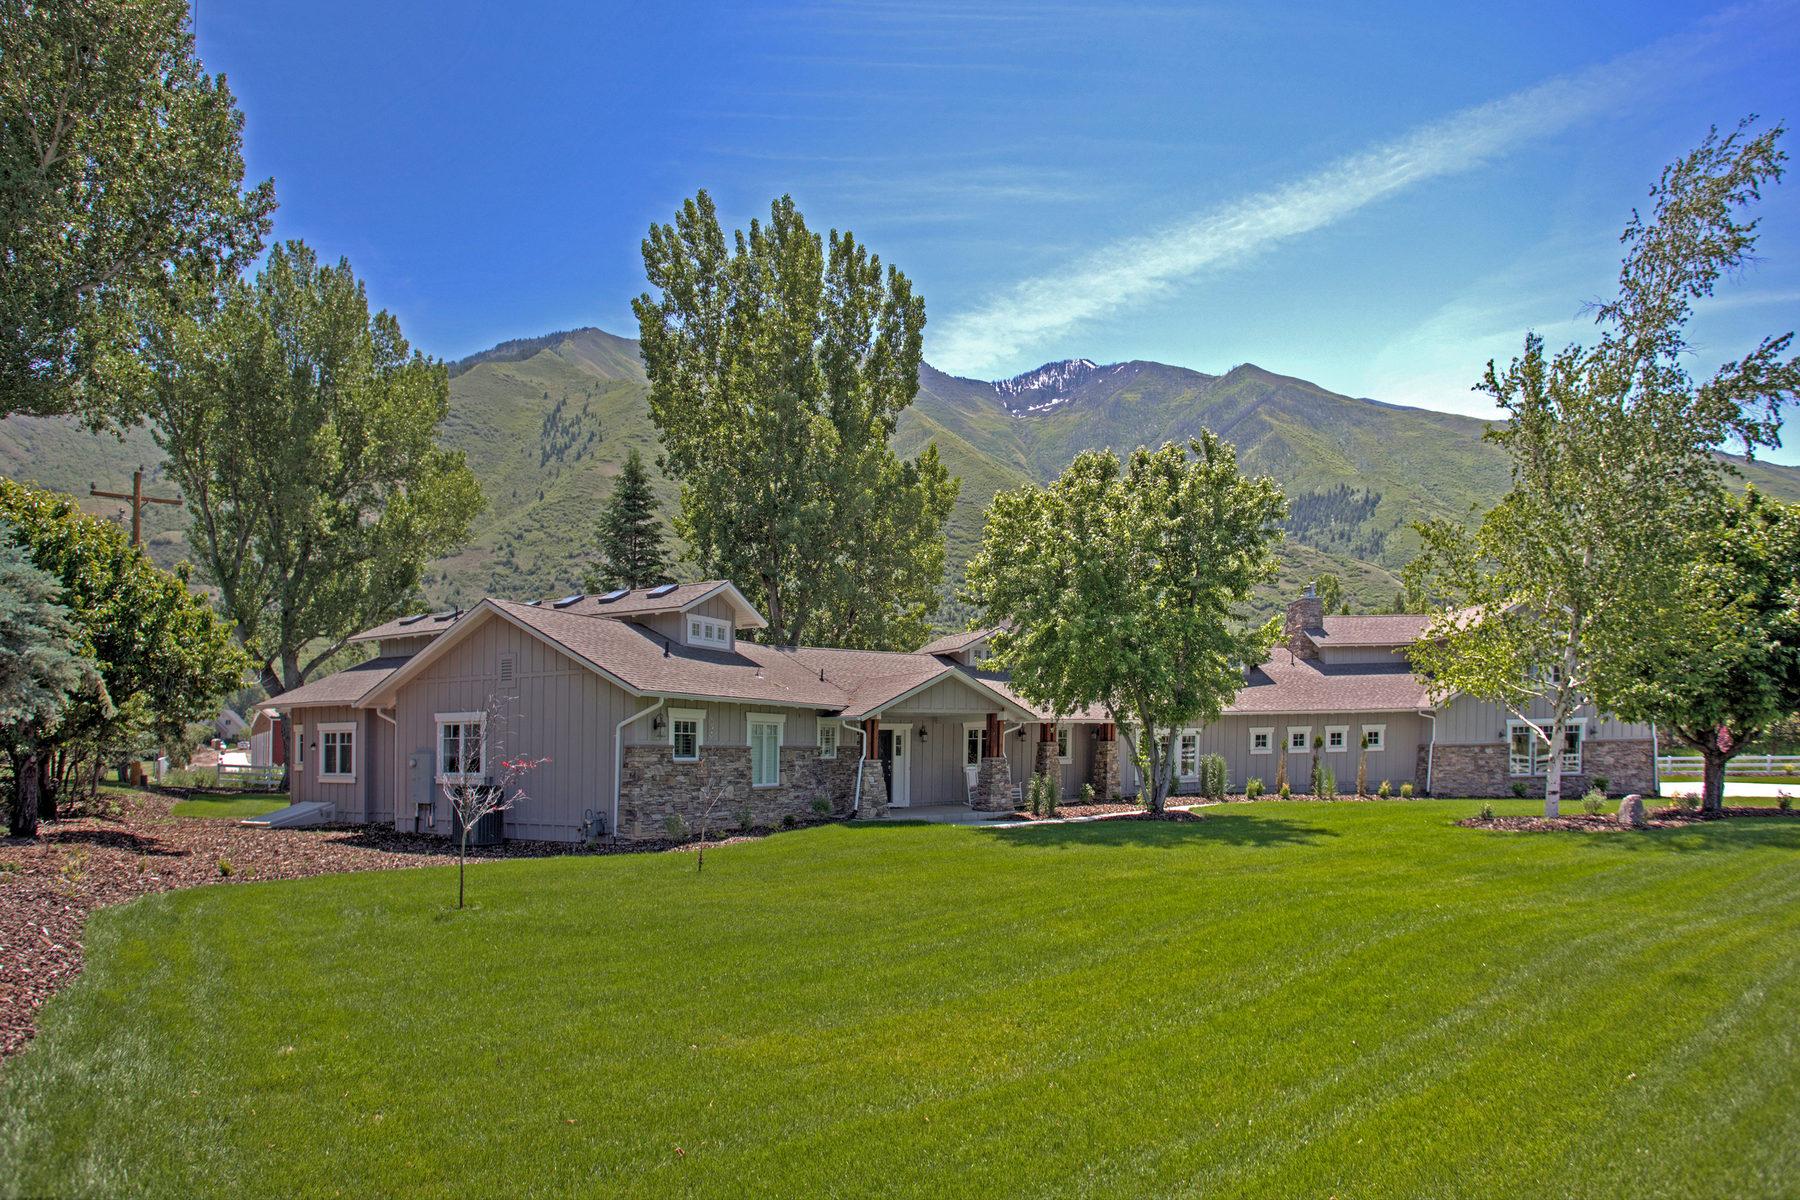 Moradia para Venda às Gorgeous Rambler 1265 South 1000 East Mapleton, Utah 84664 Estados Unidos